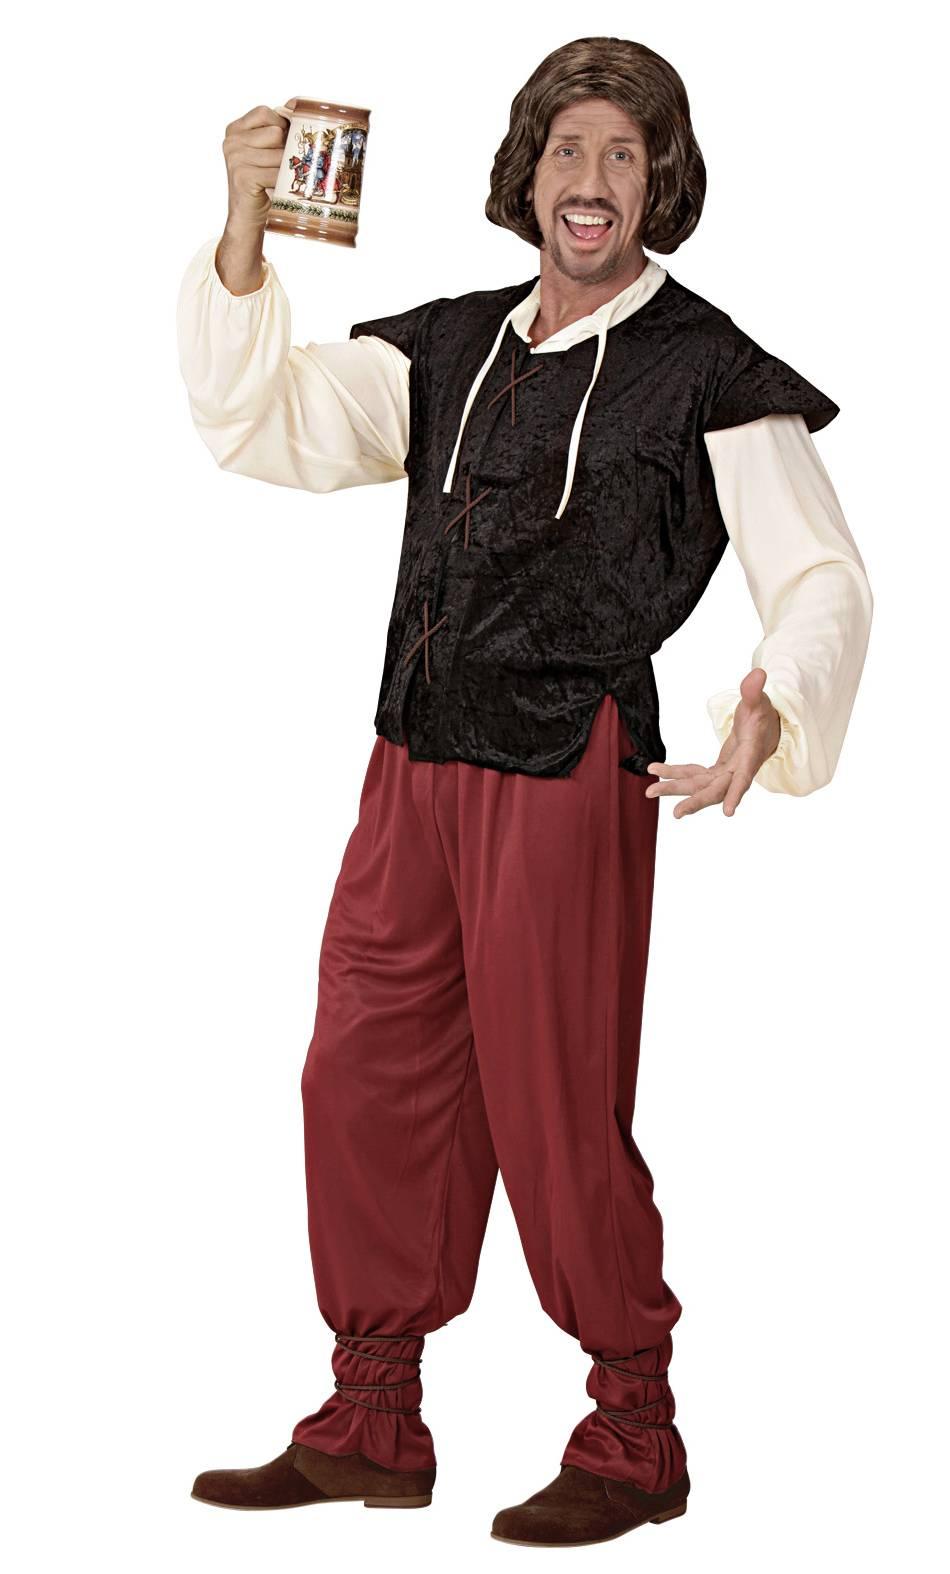 Costume-Mediéval-Homme-3